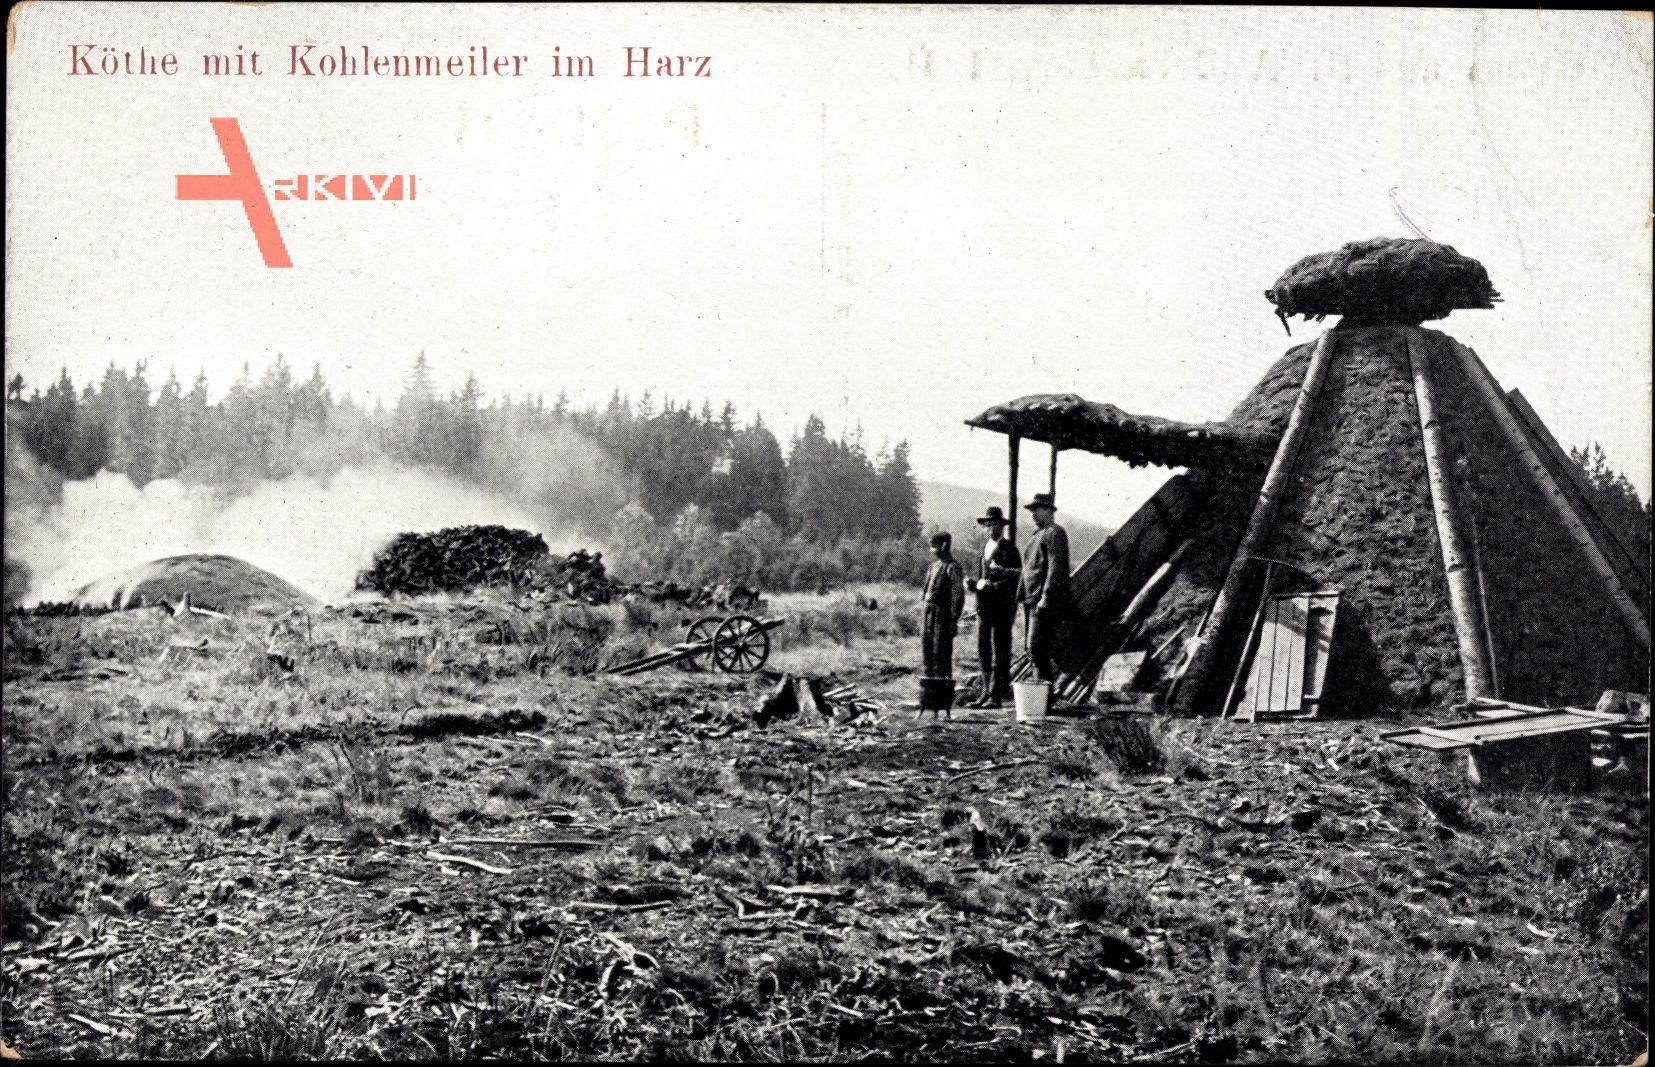 Köthe mit Kohlenmeiler im Harz, Köhler bei der Arbeit, Köhlerhütte